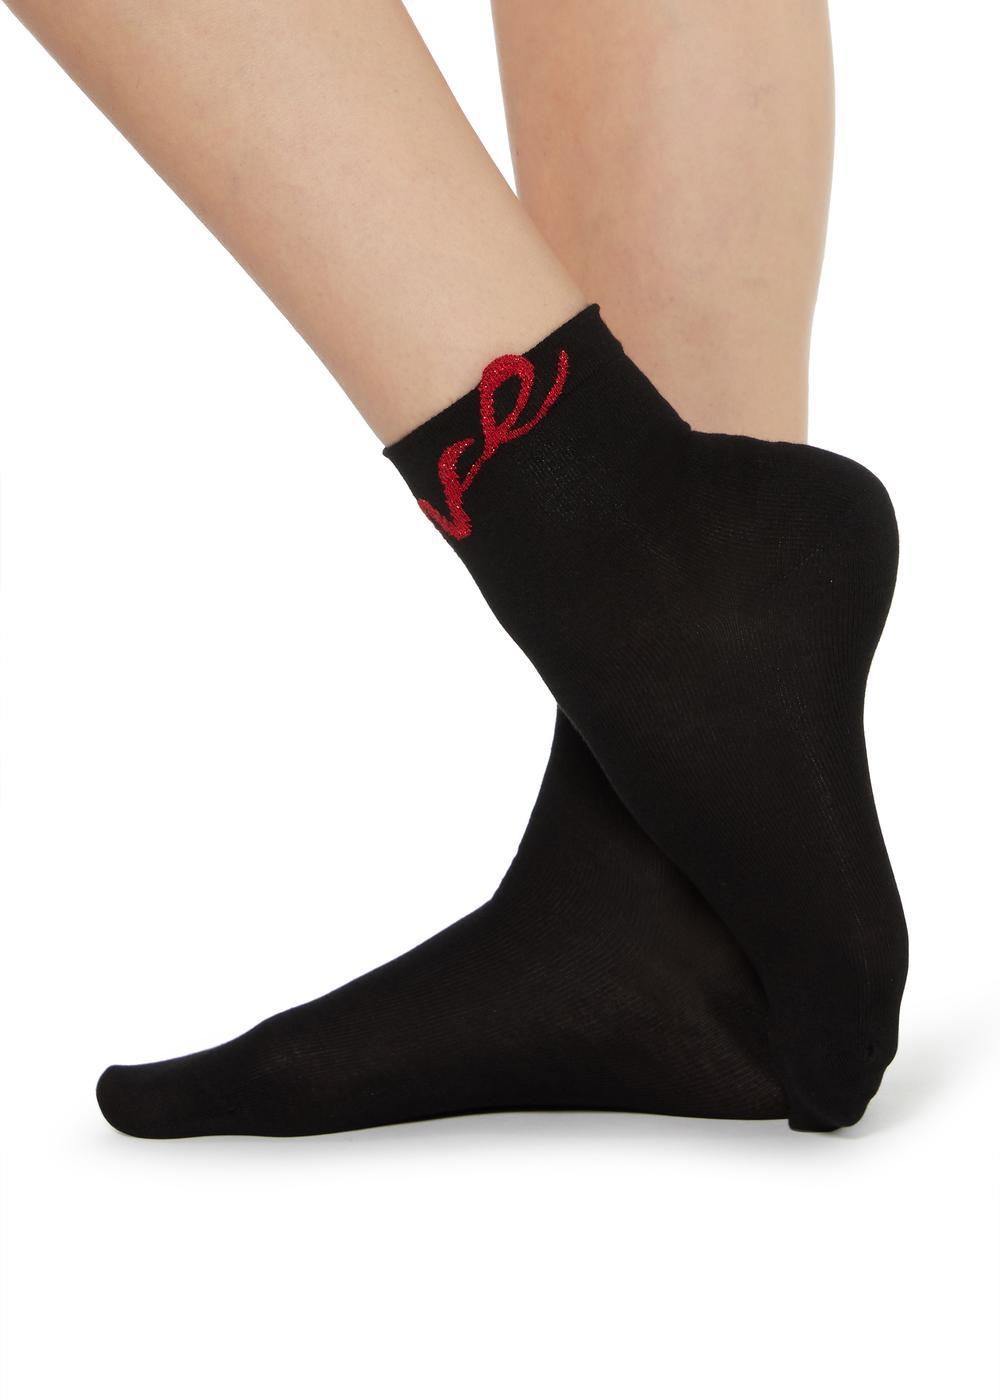 Socquettes mode Saint-Valentin